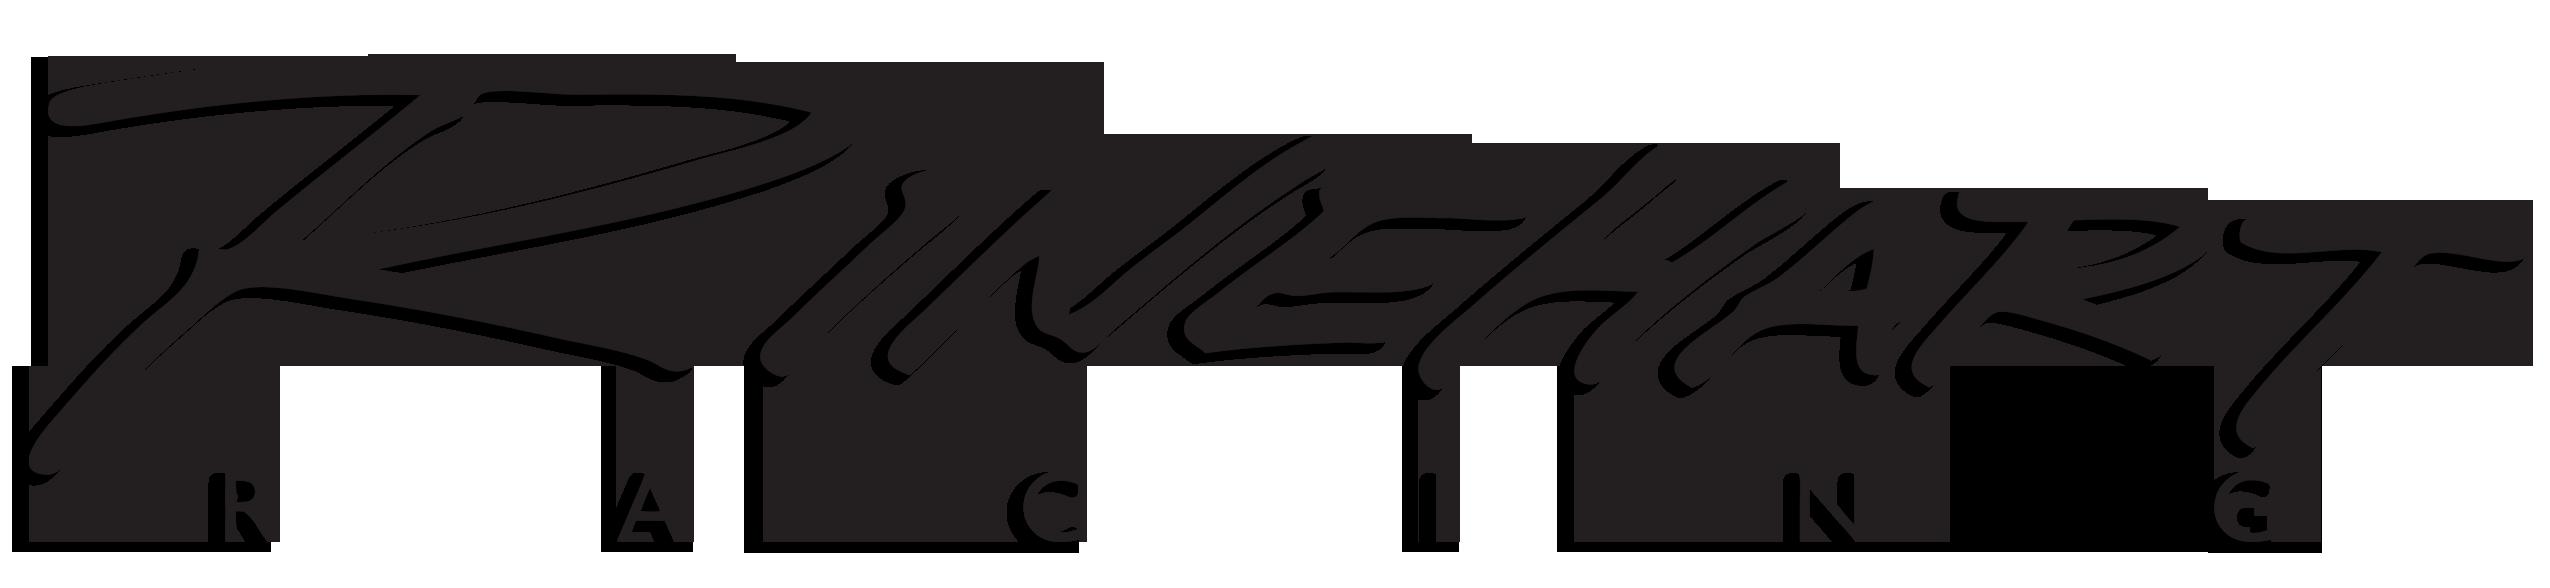 Rinehart Racing   merchandise   Racing, Harley davidson